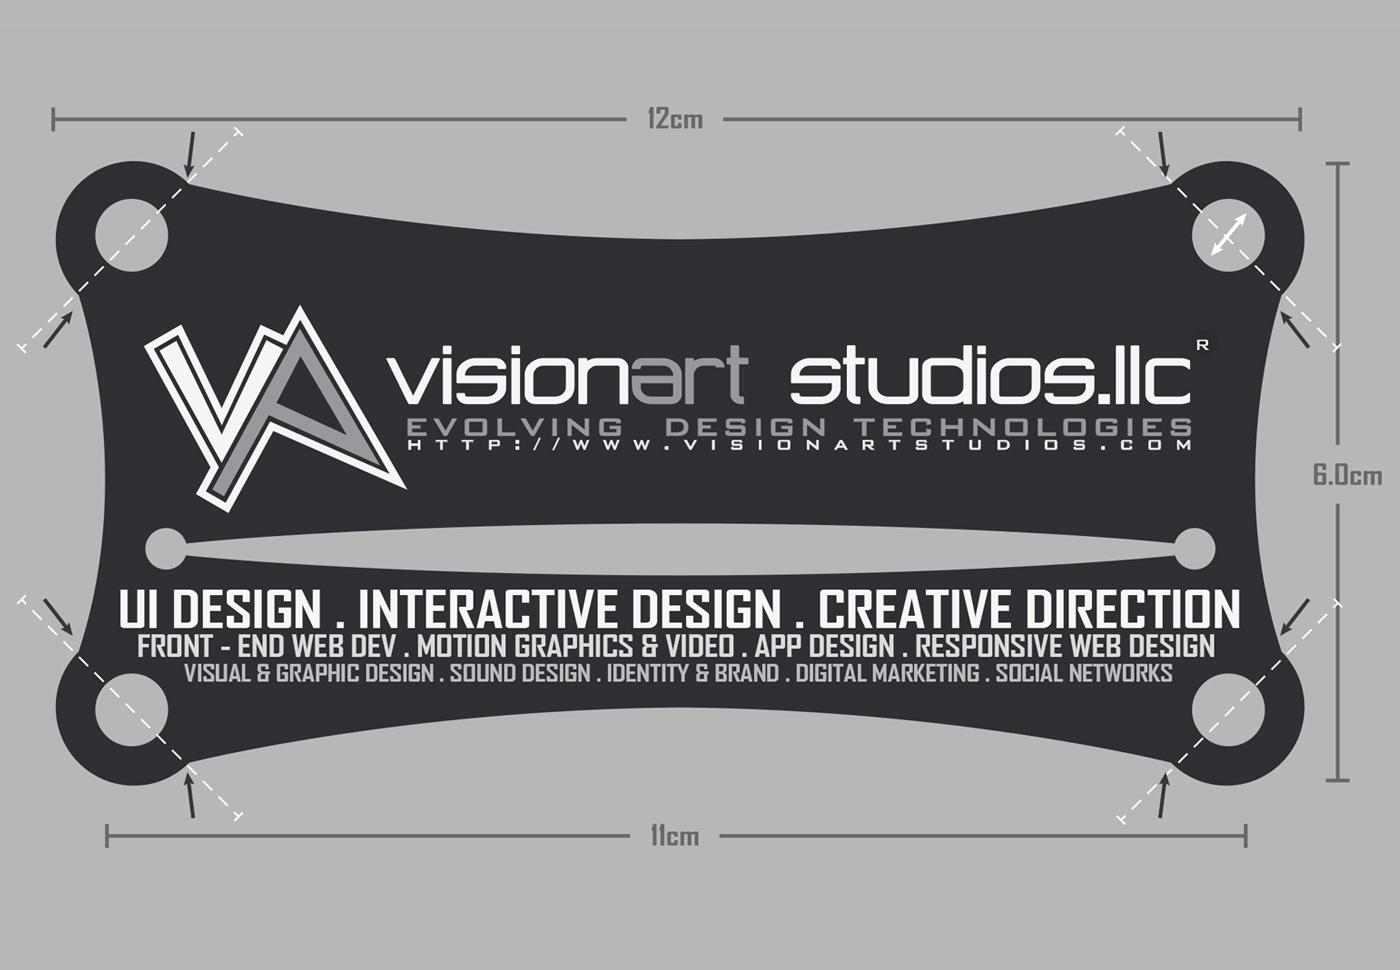 konstantinos papalazarou papalazarou konstantinos VisionArt vision art studios visionartstudios evolving design technologies business card personal card print matrix wacom intuos pro large